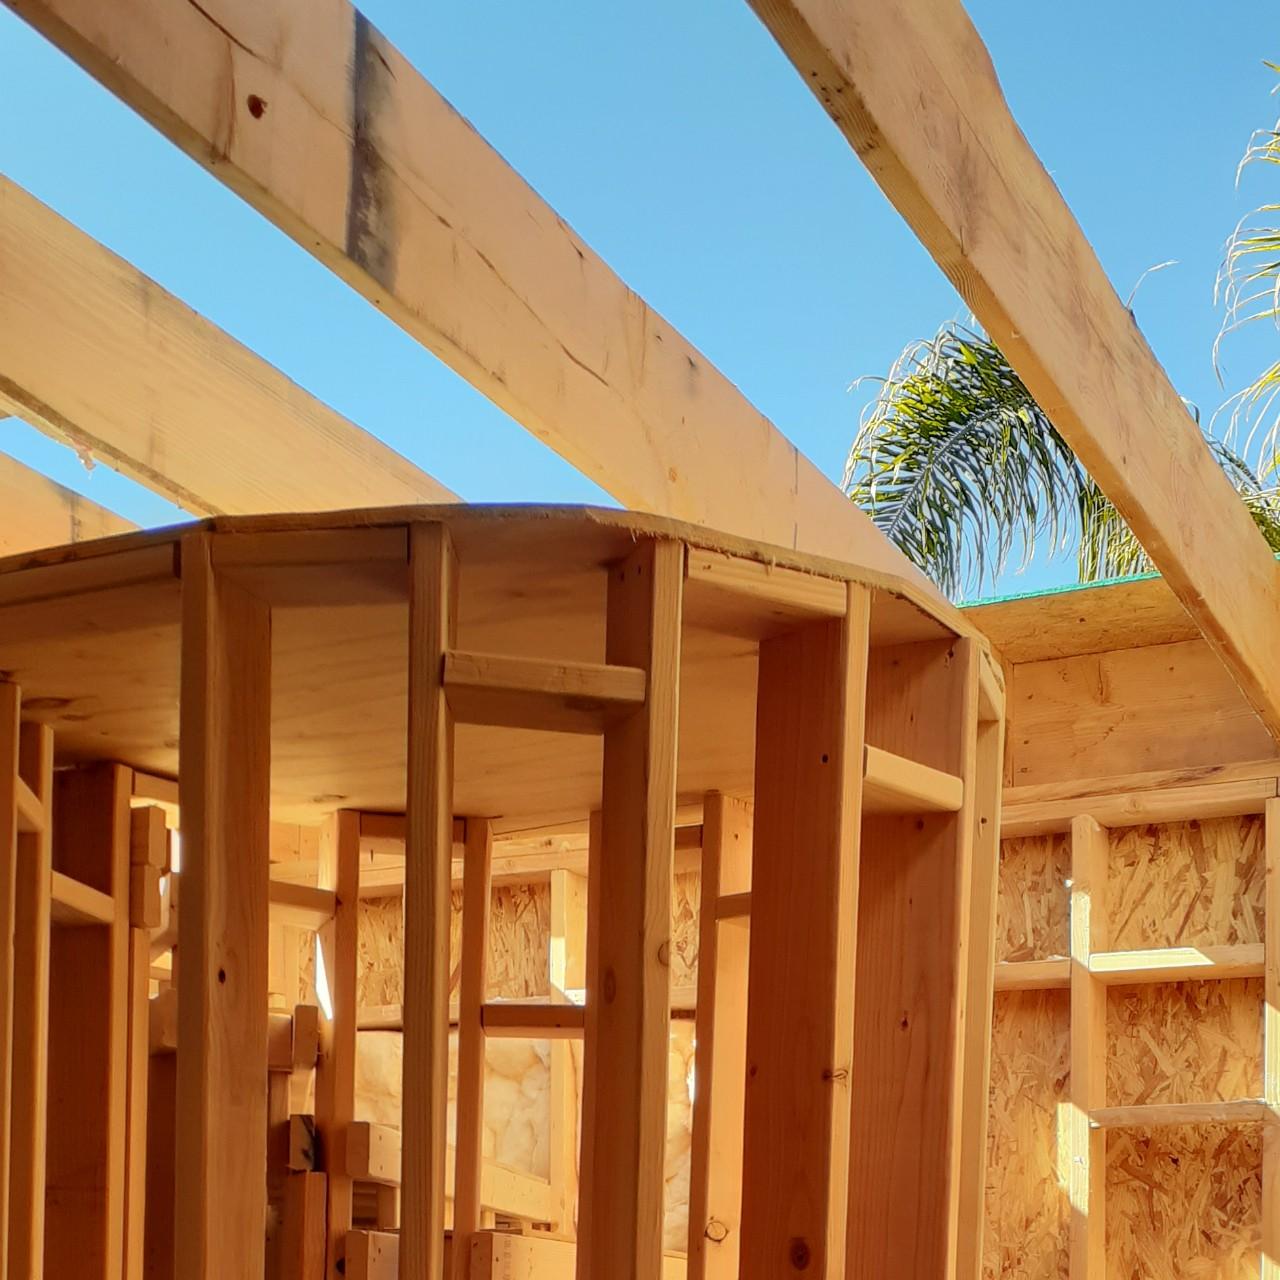 carpentry-wood-framing-second-floor-home-addition--framing-49